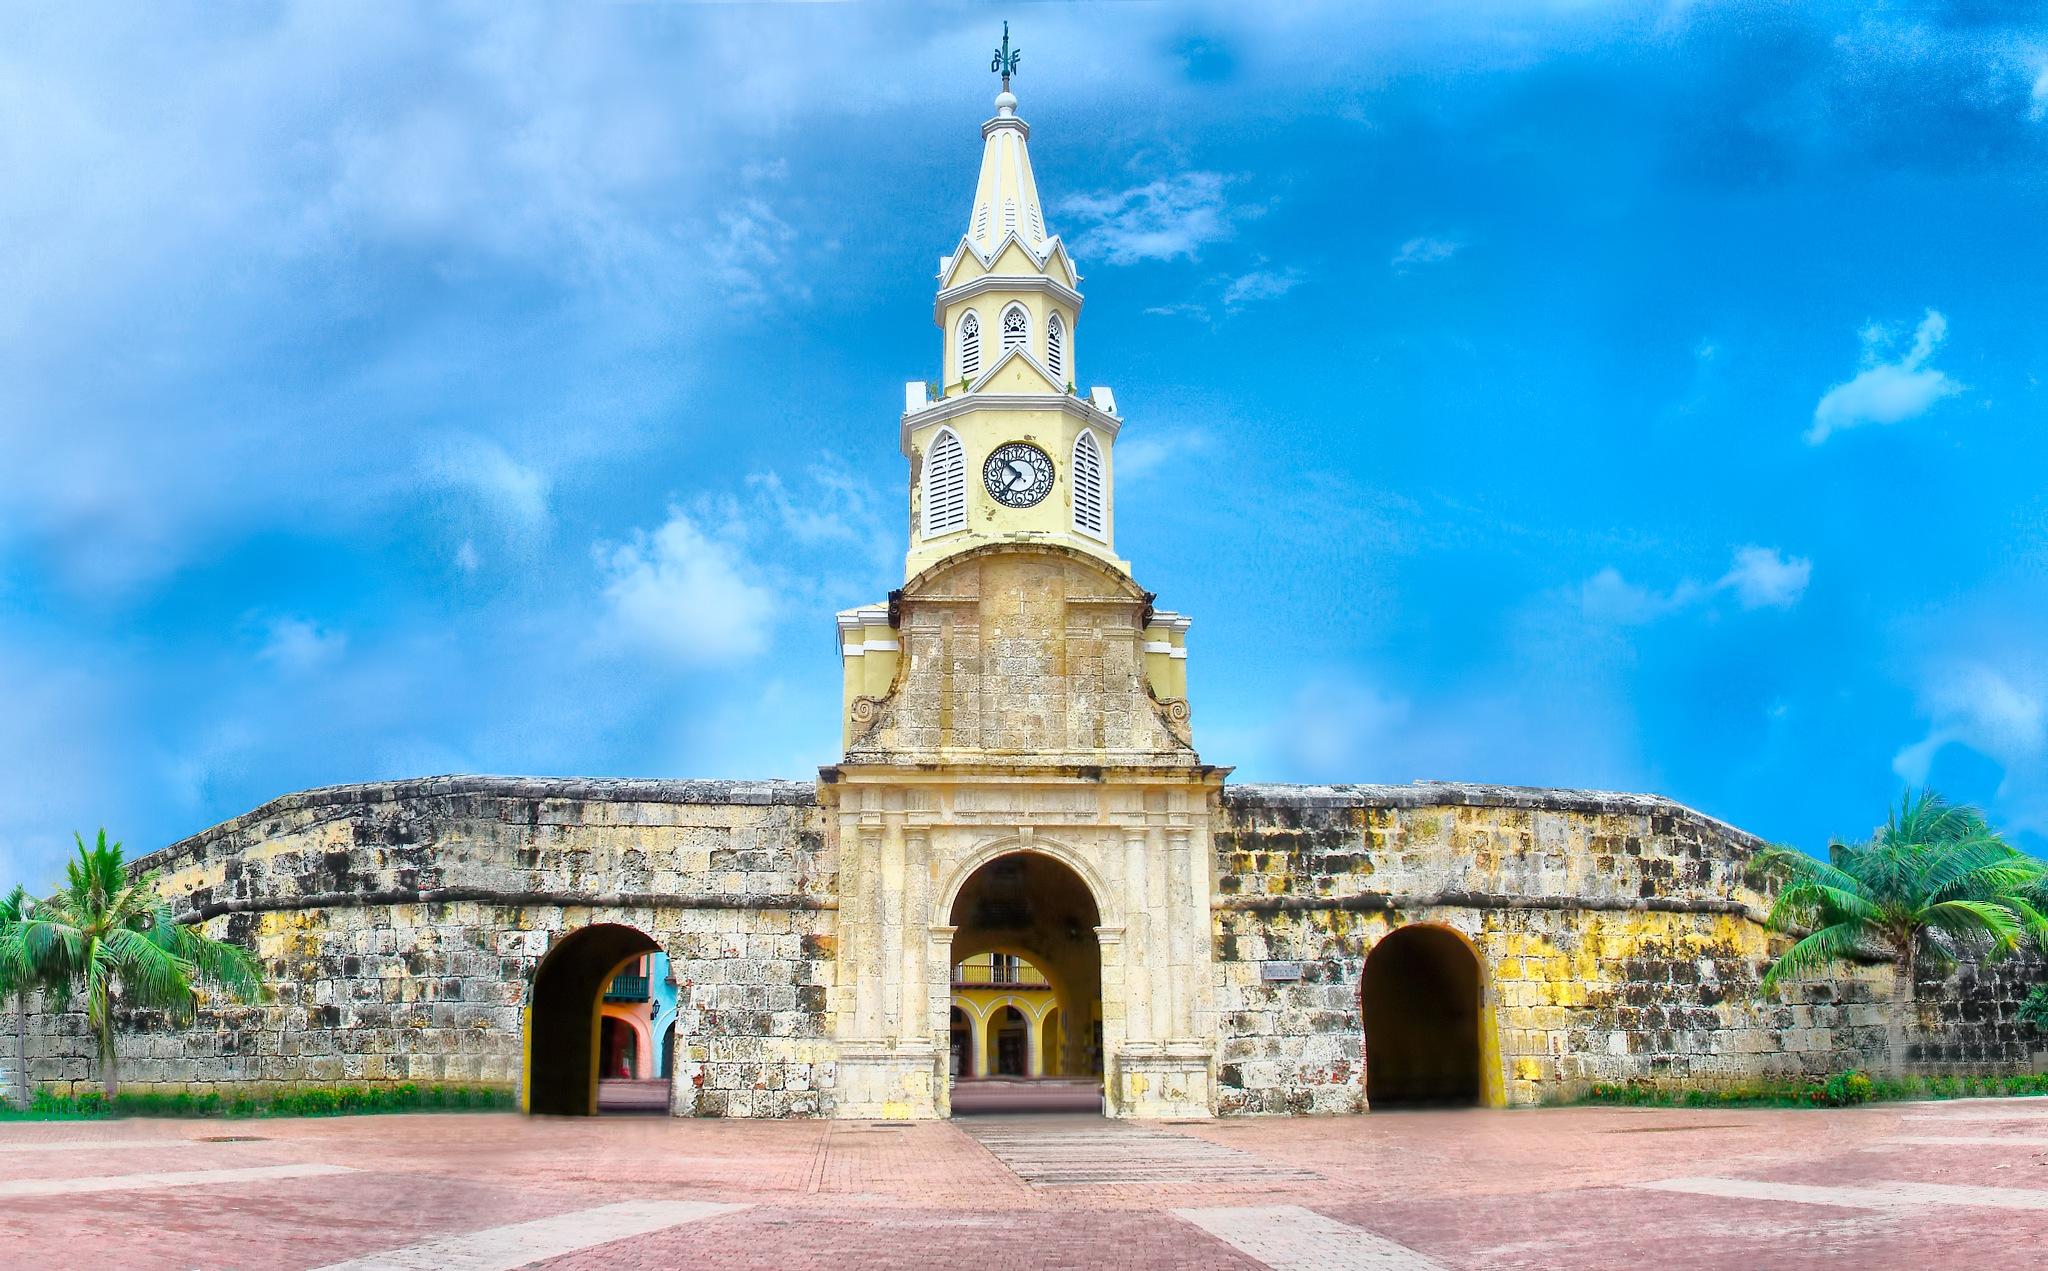 Clock Tower - Cartagena, Colombia by Jorge A. Bohorquez S.